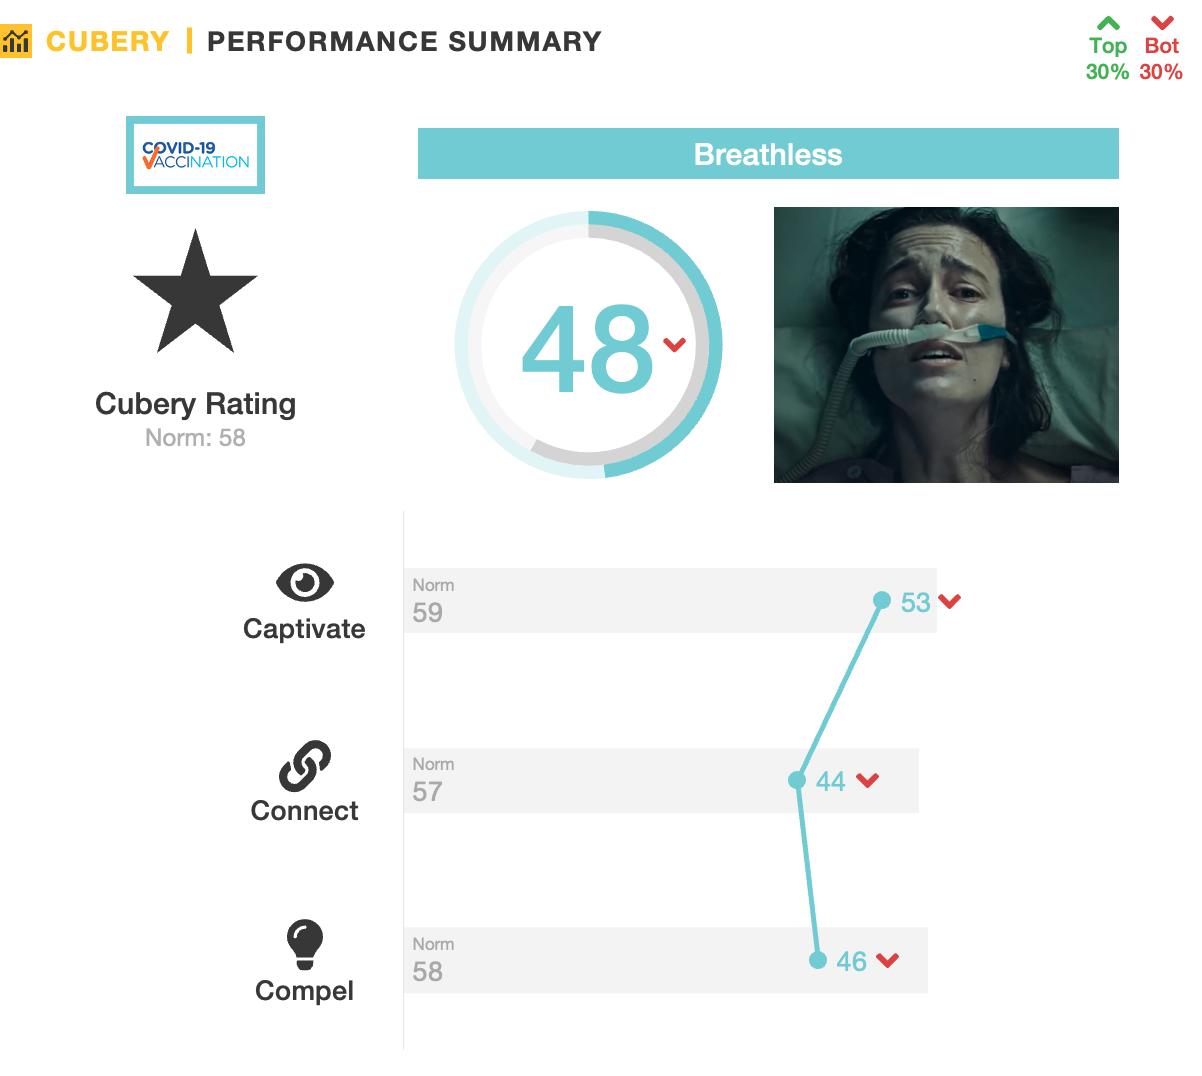 Australian Covid Ad 'Breathless' - Advertising Testing Cubery - Performance Summary